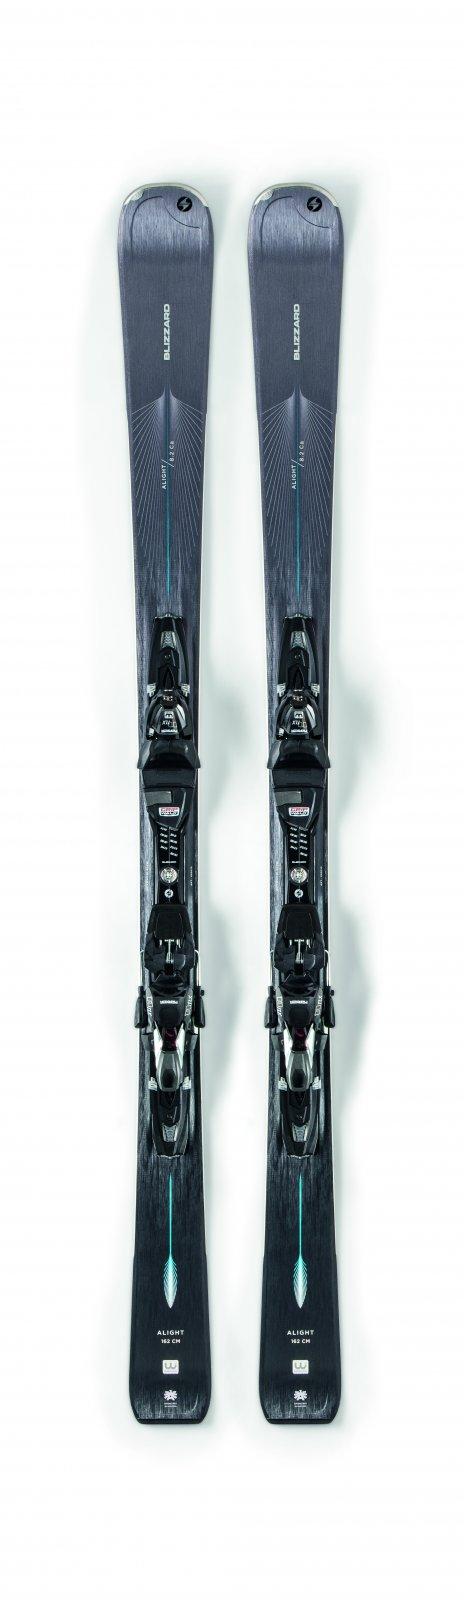 2020 Blizzard Alight 8.2 Ca + Marker TLX11 Women's Skis